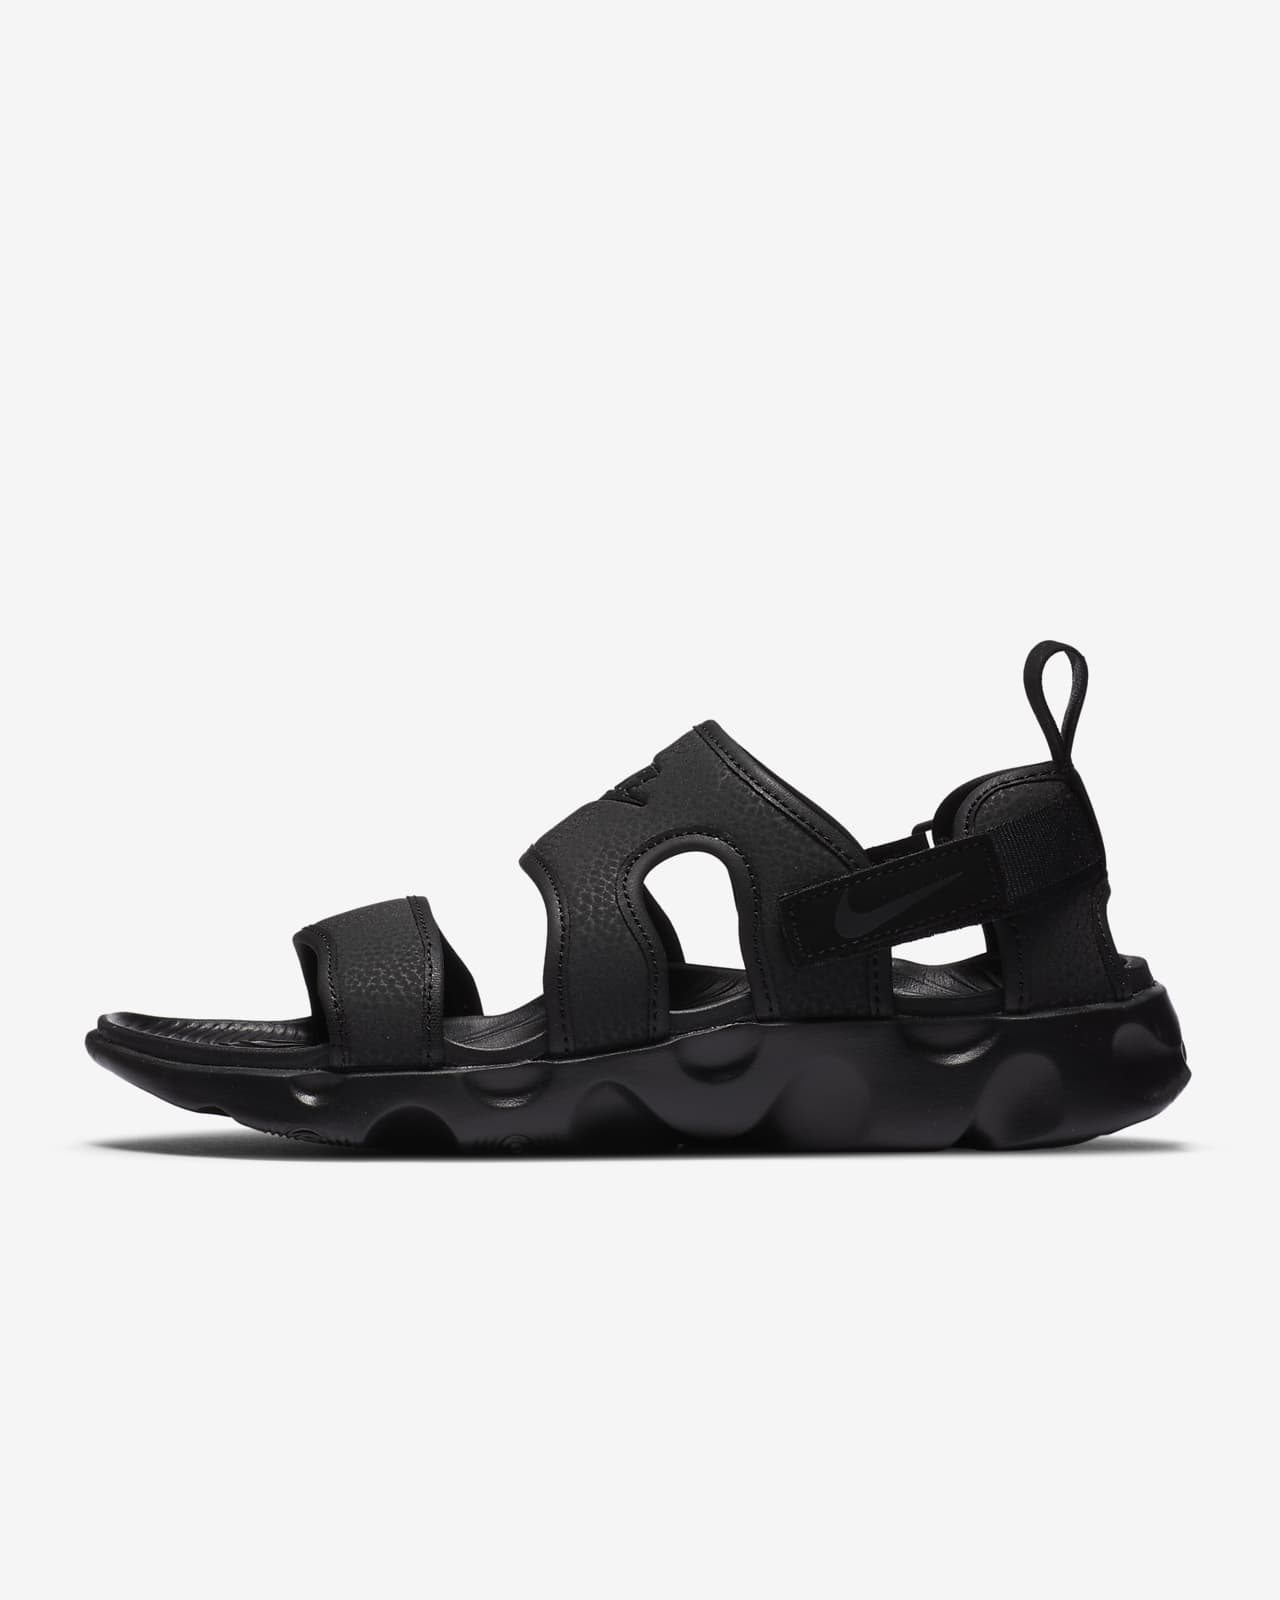 Sandale Nike Owaysis pour Femme